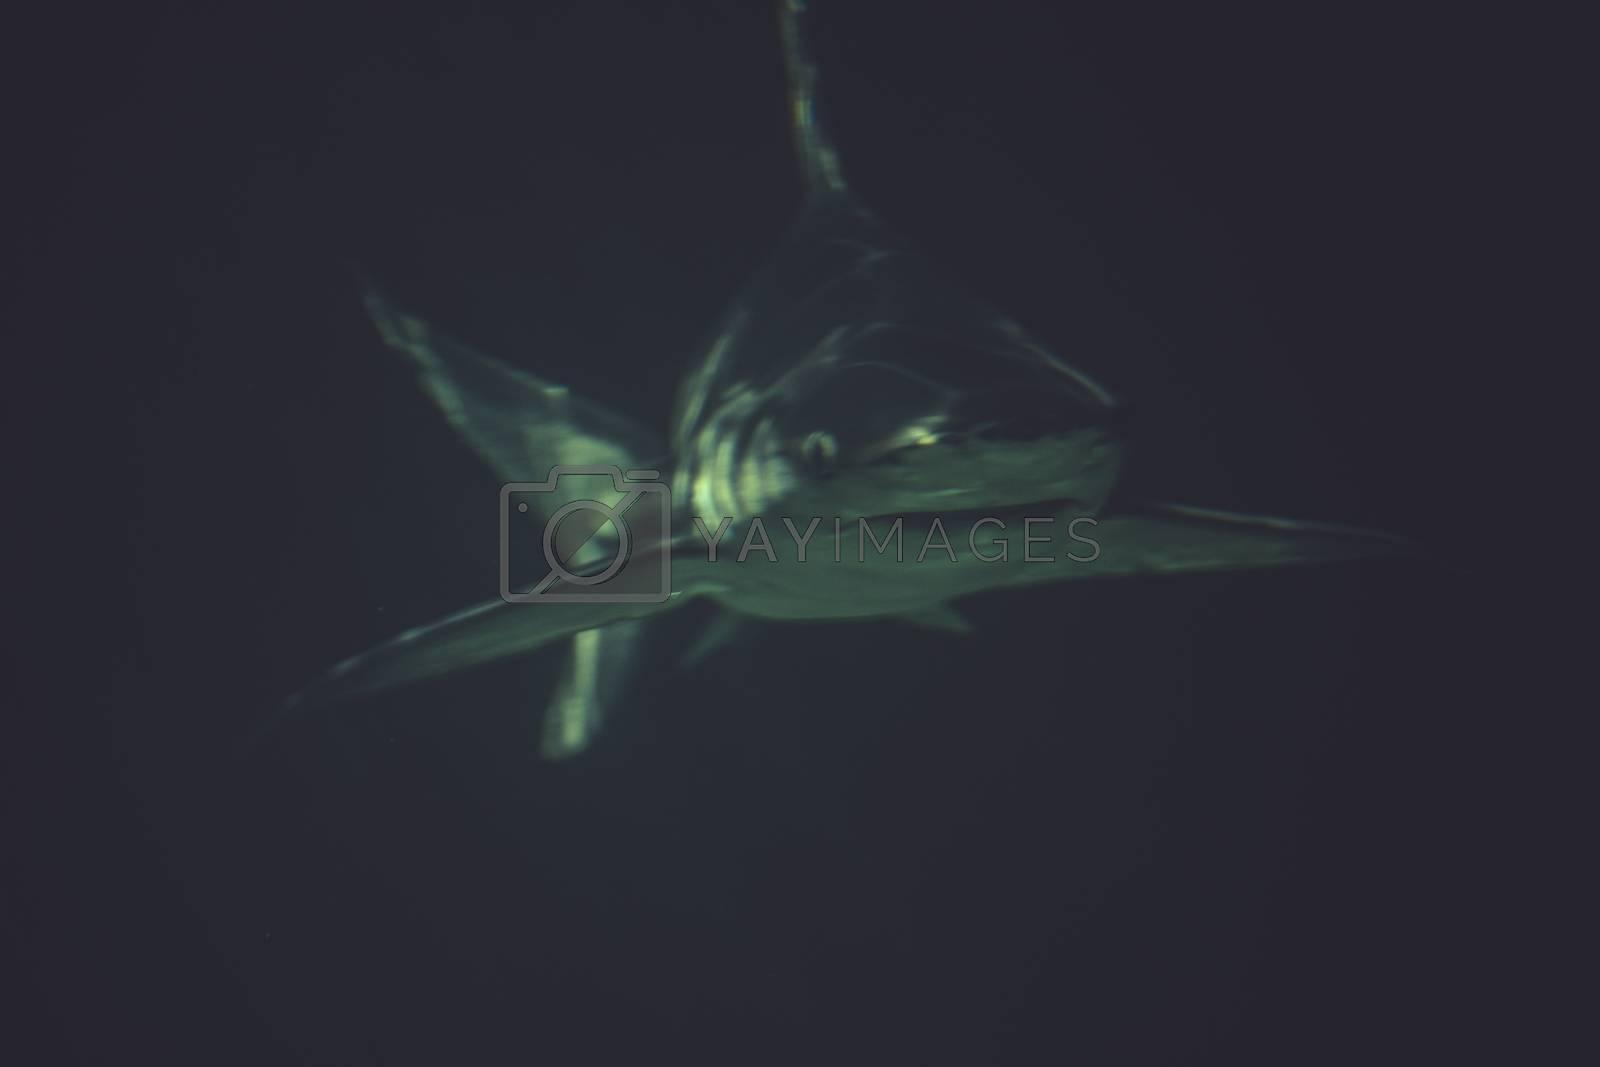 rerocious, Great Shark Underwater Photo  in the deep blue water.